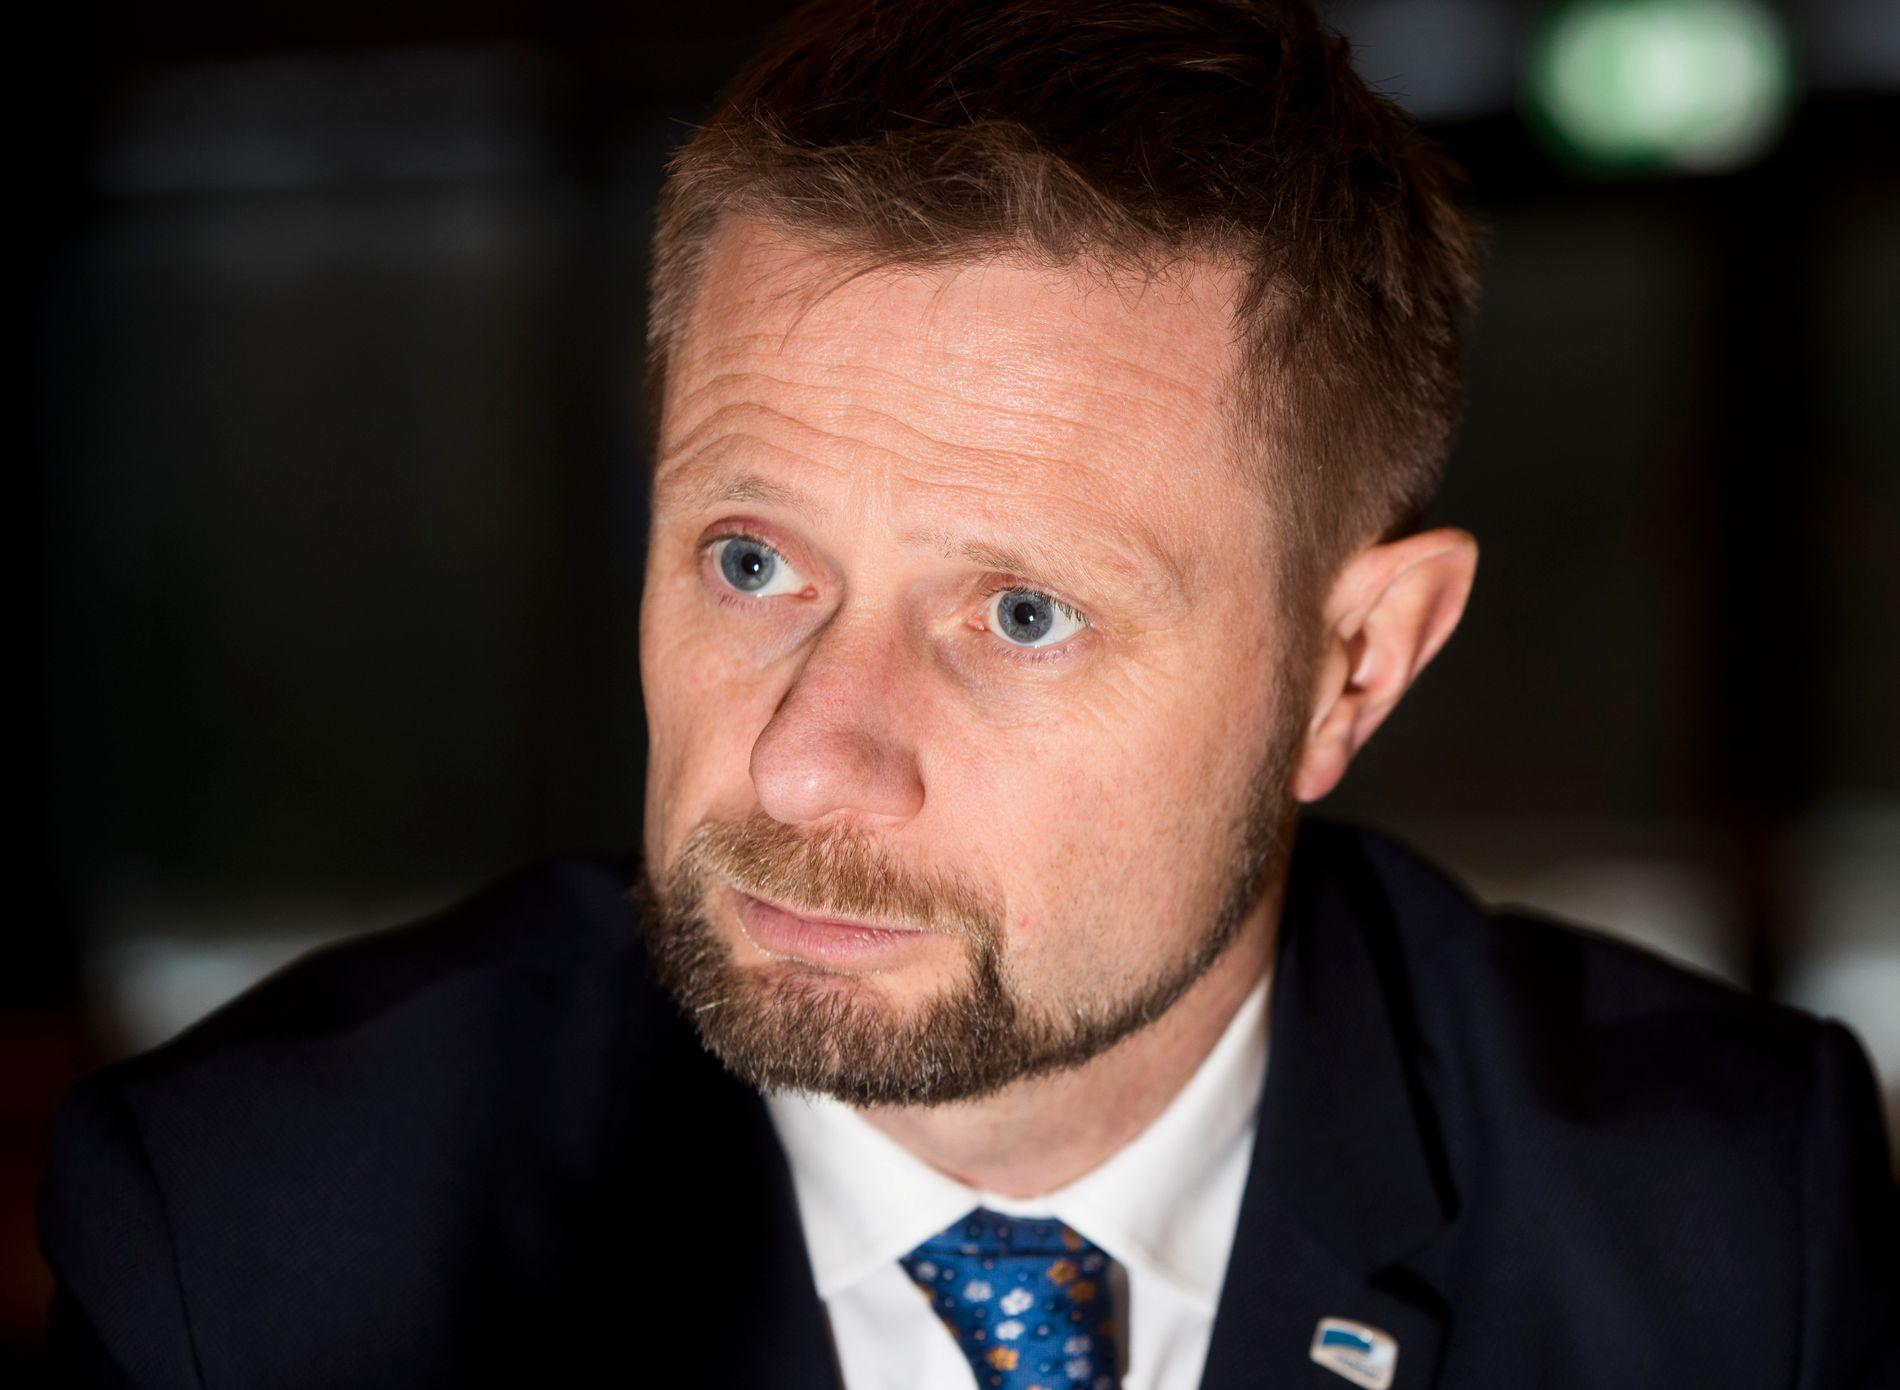 REGULERER NIKOTIN: Helseminister Bent Høie.